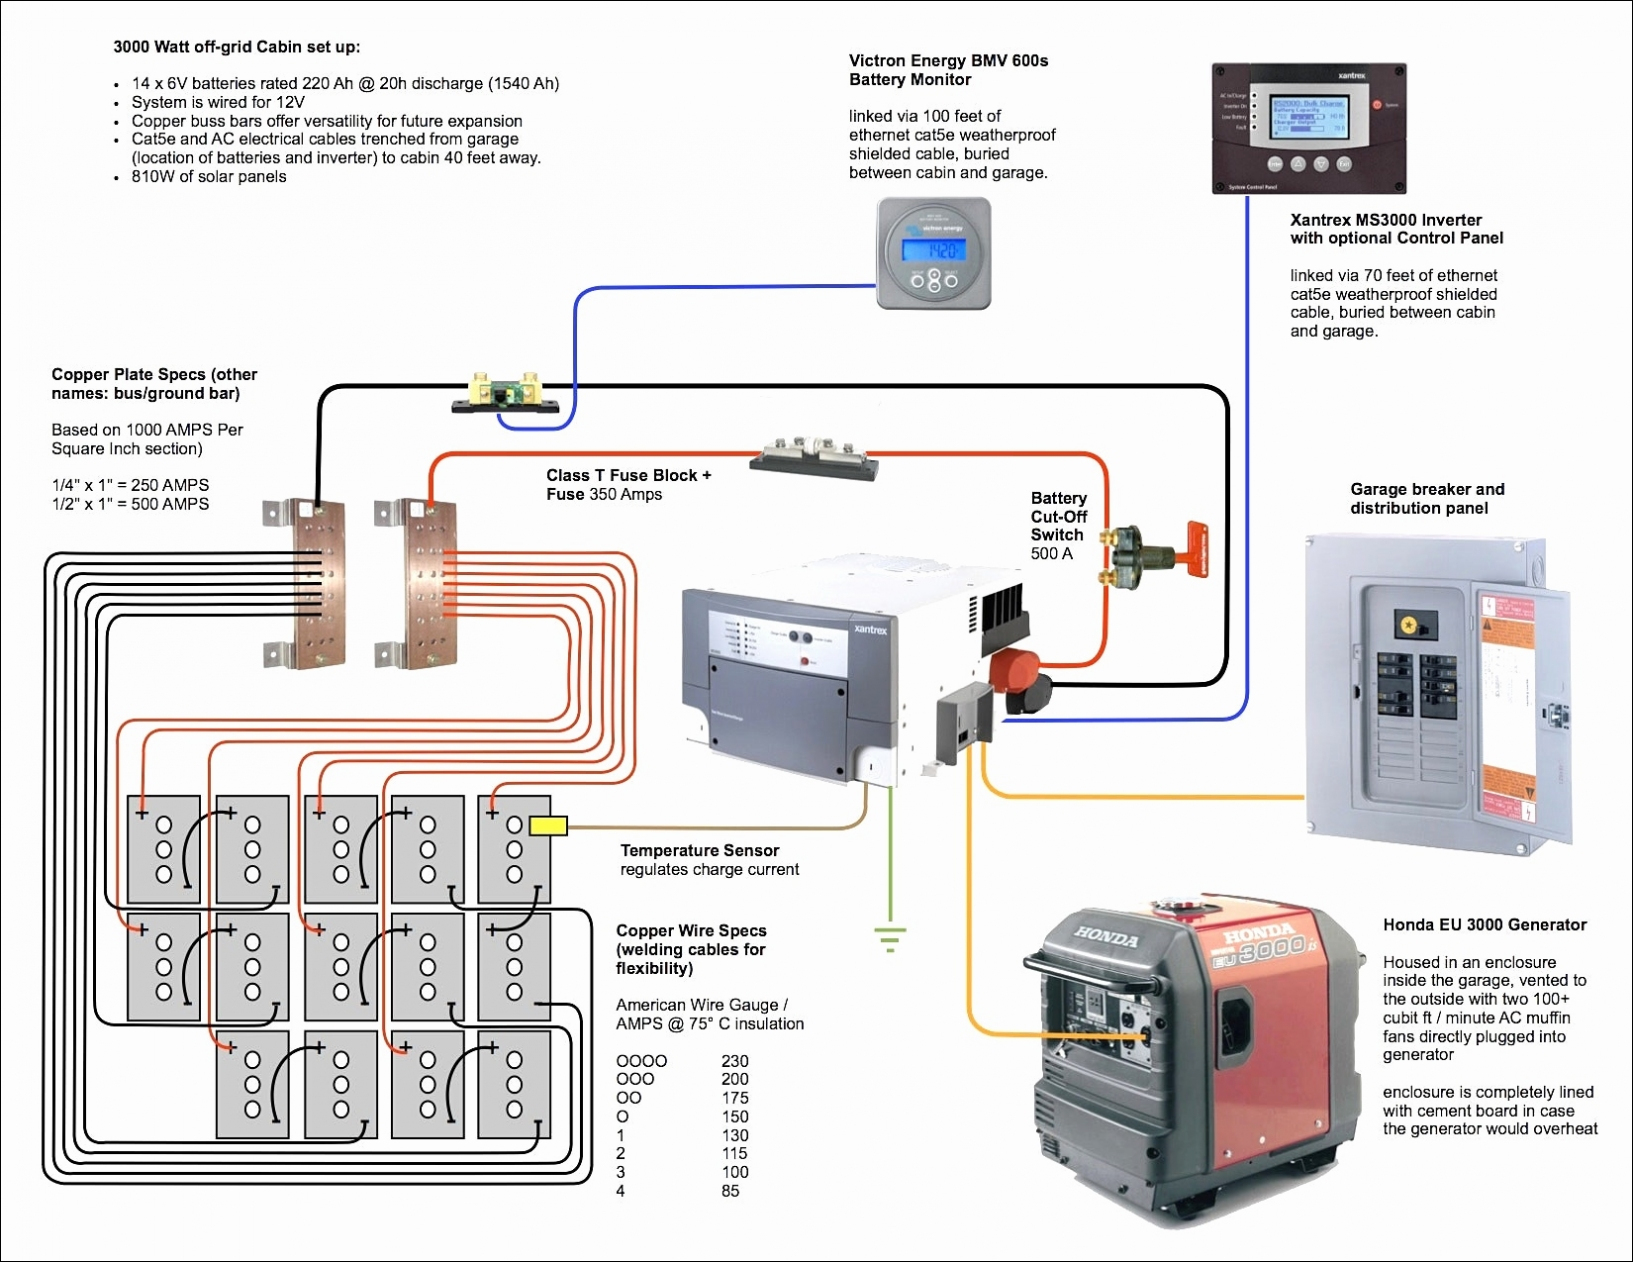 L14 30 Wiring Diagram 125V | Wiring Library - L14-30 Wiring Diagram